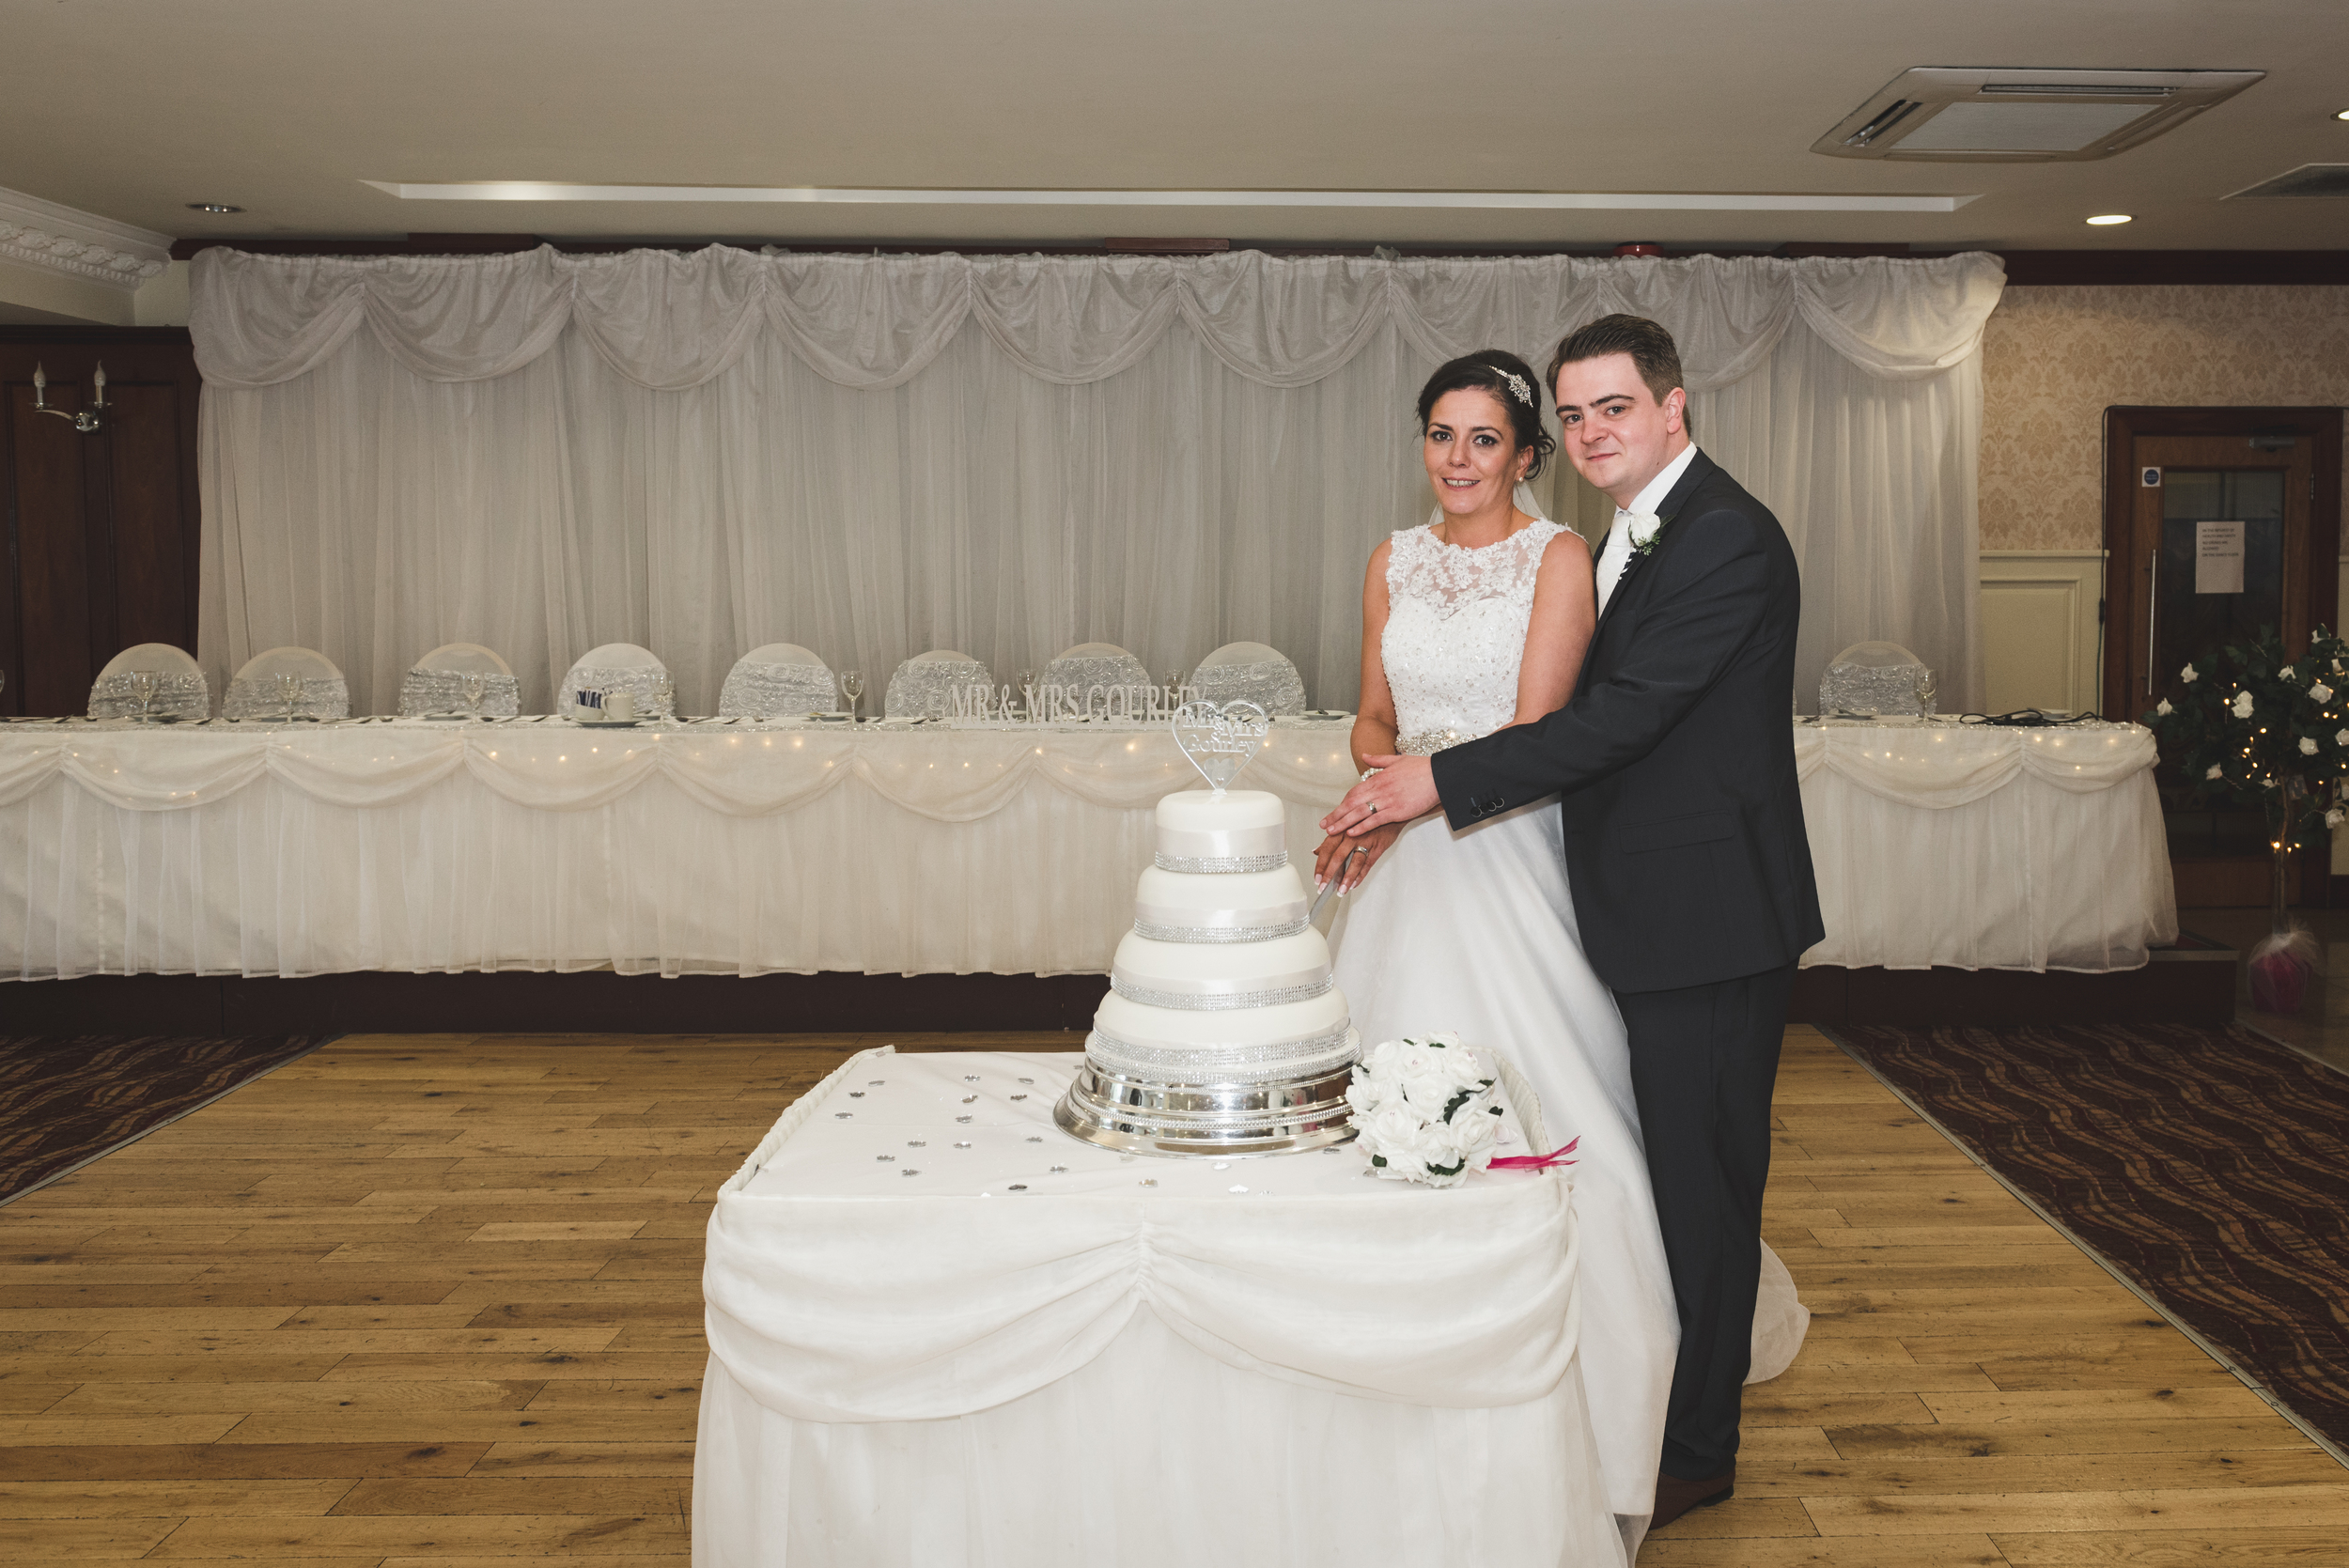 Belfast_Wedding_Photographer_Balmoral_Hotel_Cutting_The_Cake